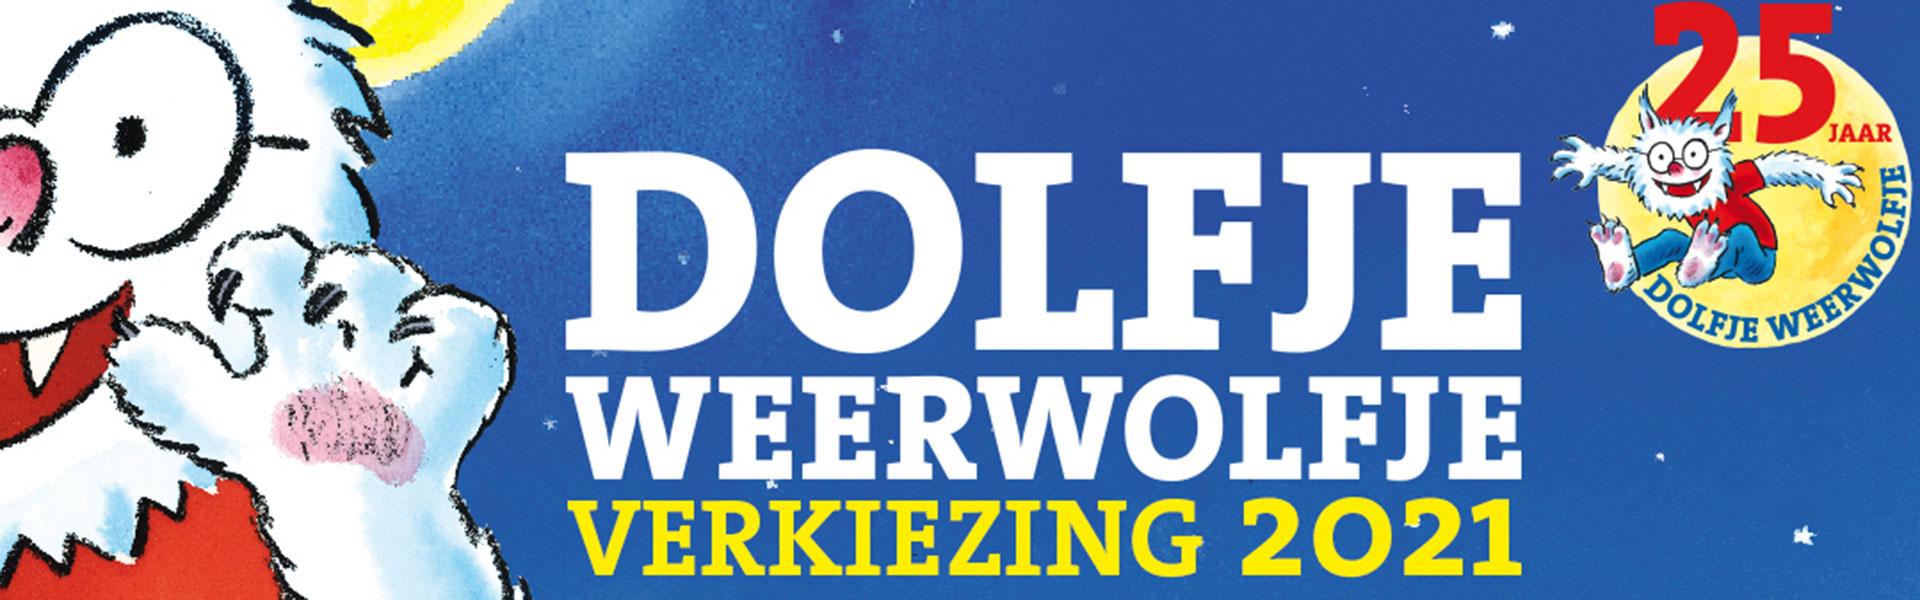 Dolfje Weerwolfje verkiezing